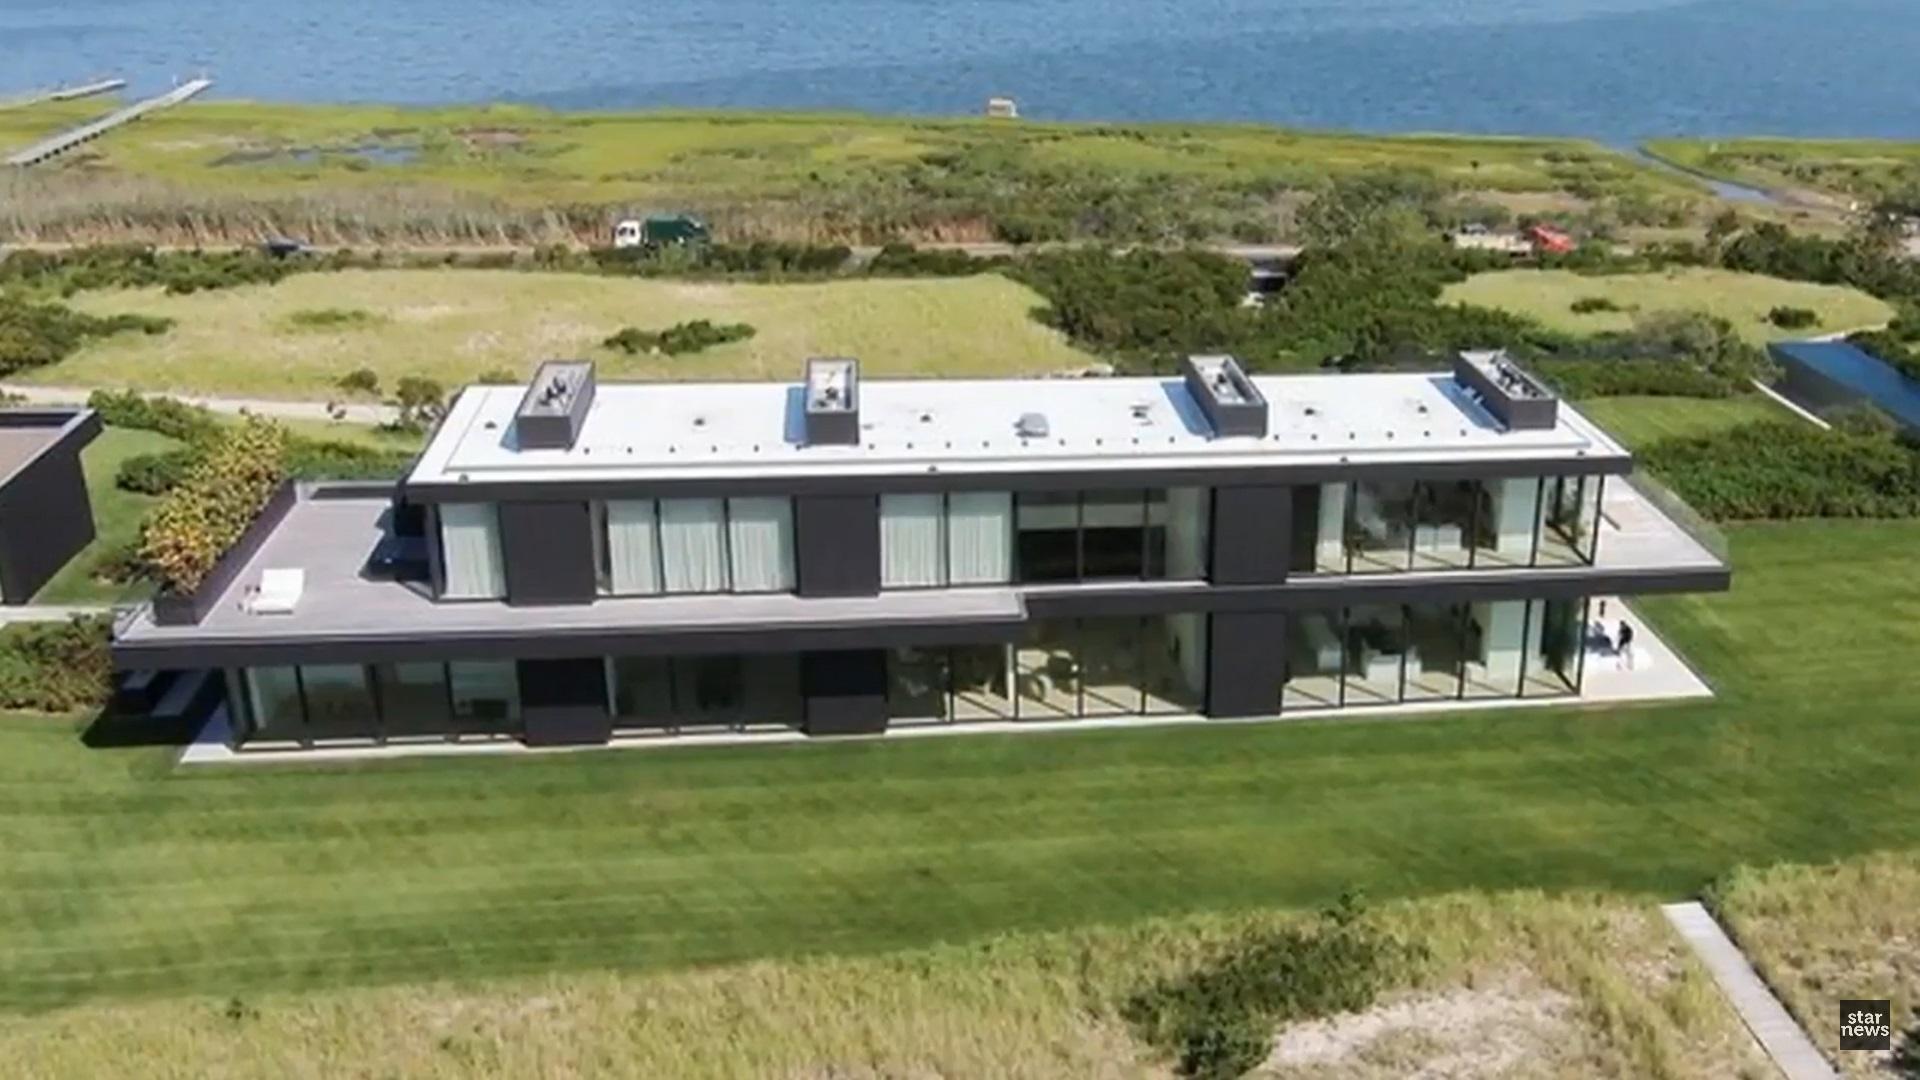 Ken Griffin Reportedly Set To Buy Calvin Klein S 100 Million Hamptons Compound Celebrity Net Worth